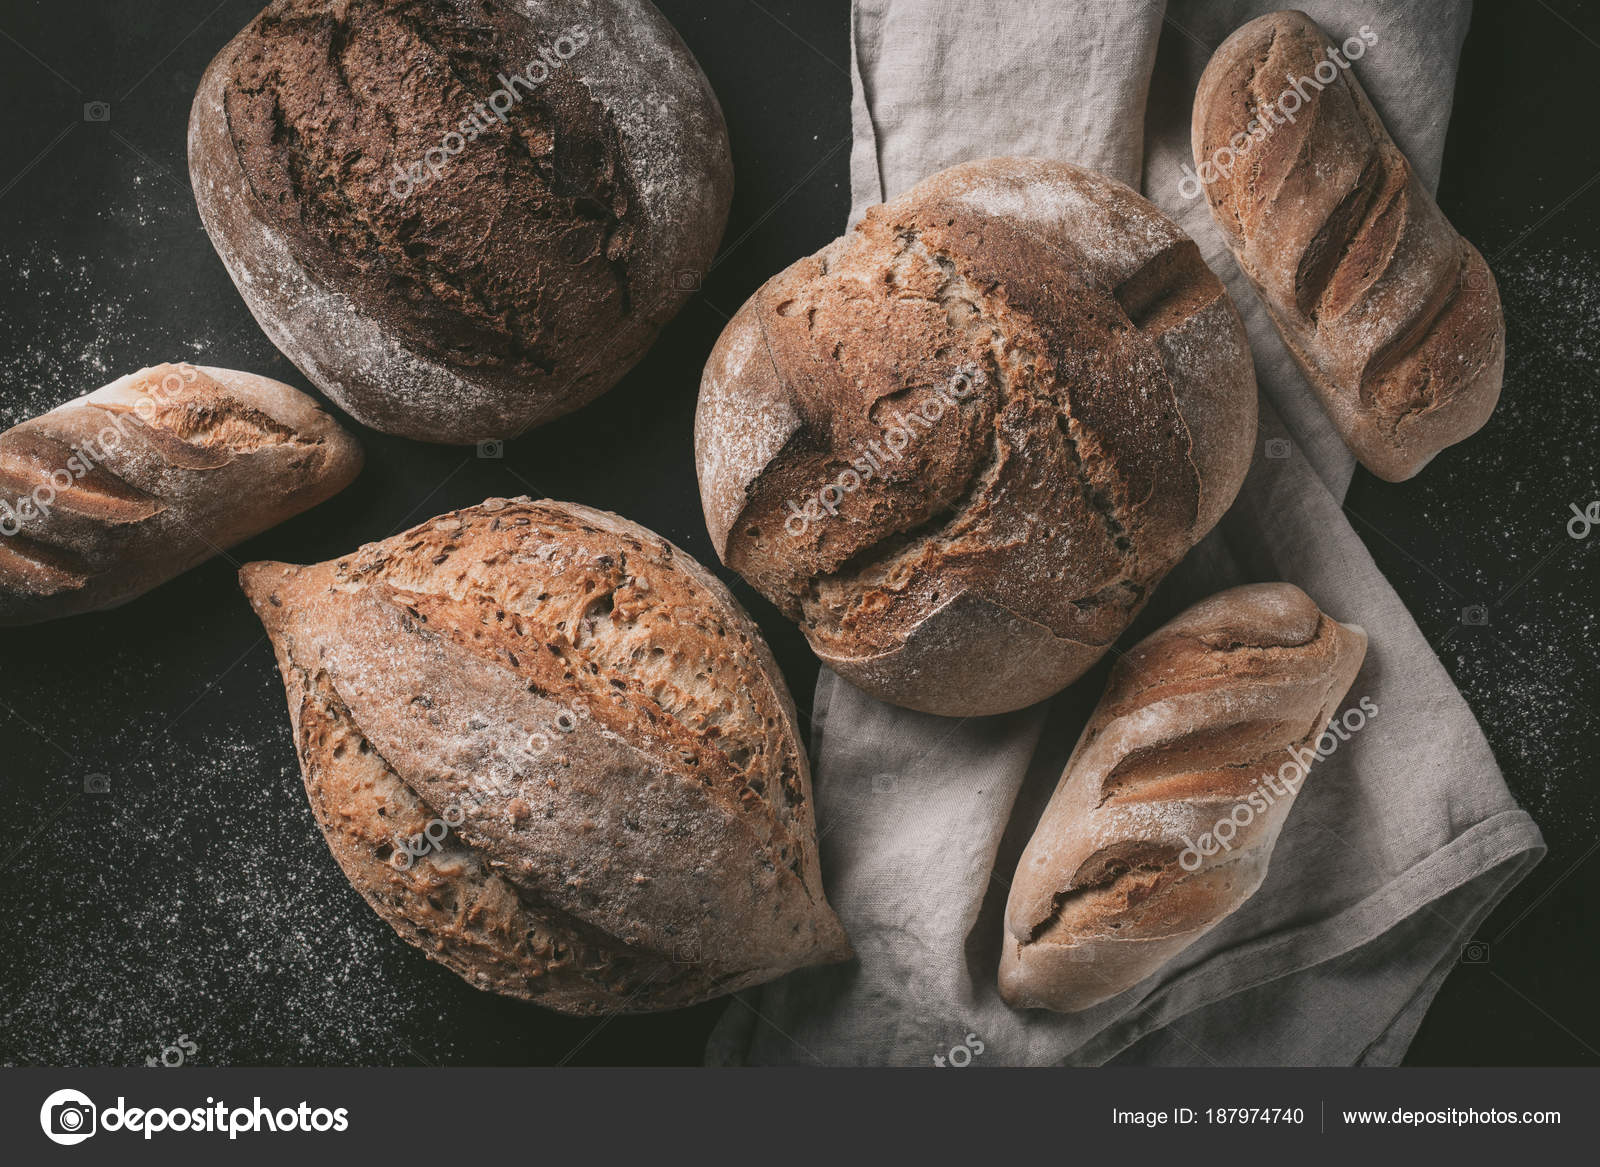 gray kitchen towels target table sets 平躺的各种面包选择 杂粮在厨房毛巾上的乡村面包灰色背景 顶部视图 杂粮在厨房毛巾上的乡村面包